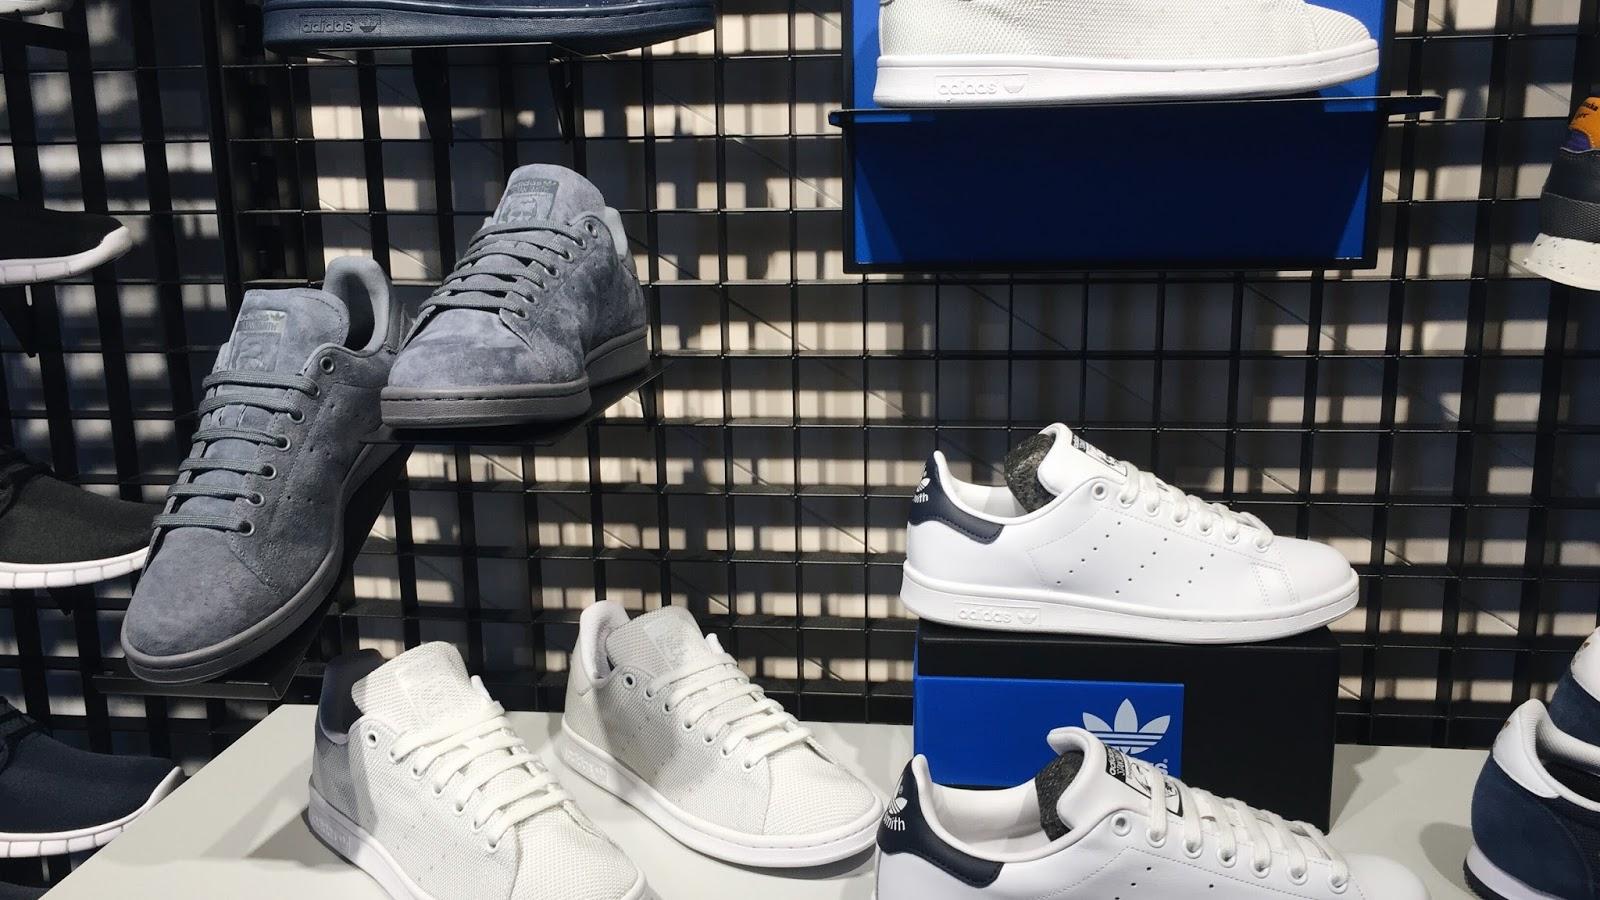 Nike Shoes Bag Malaysia